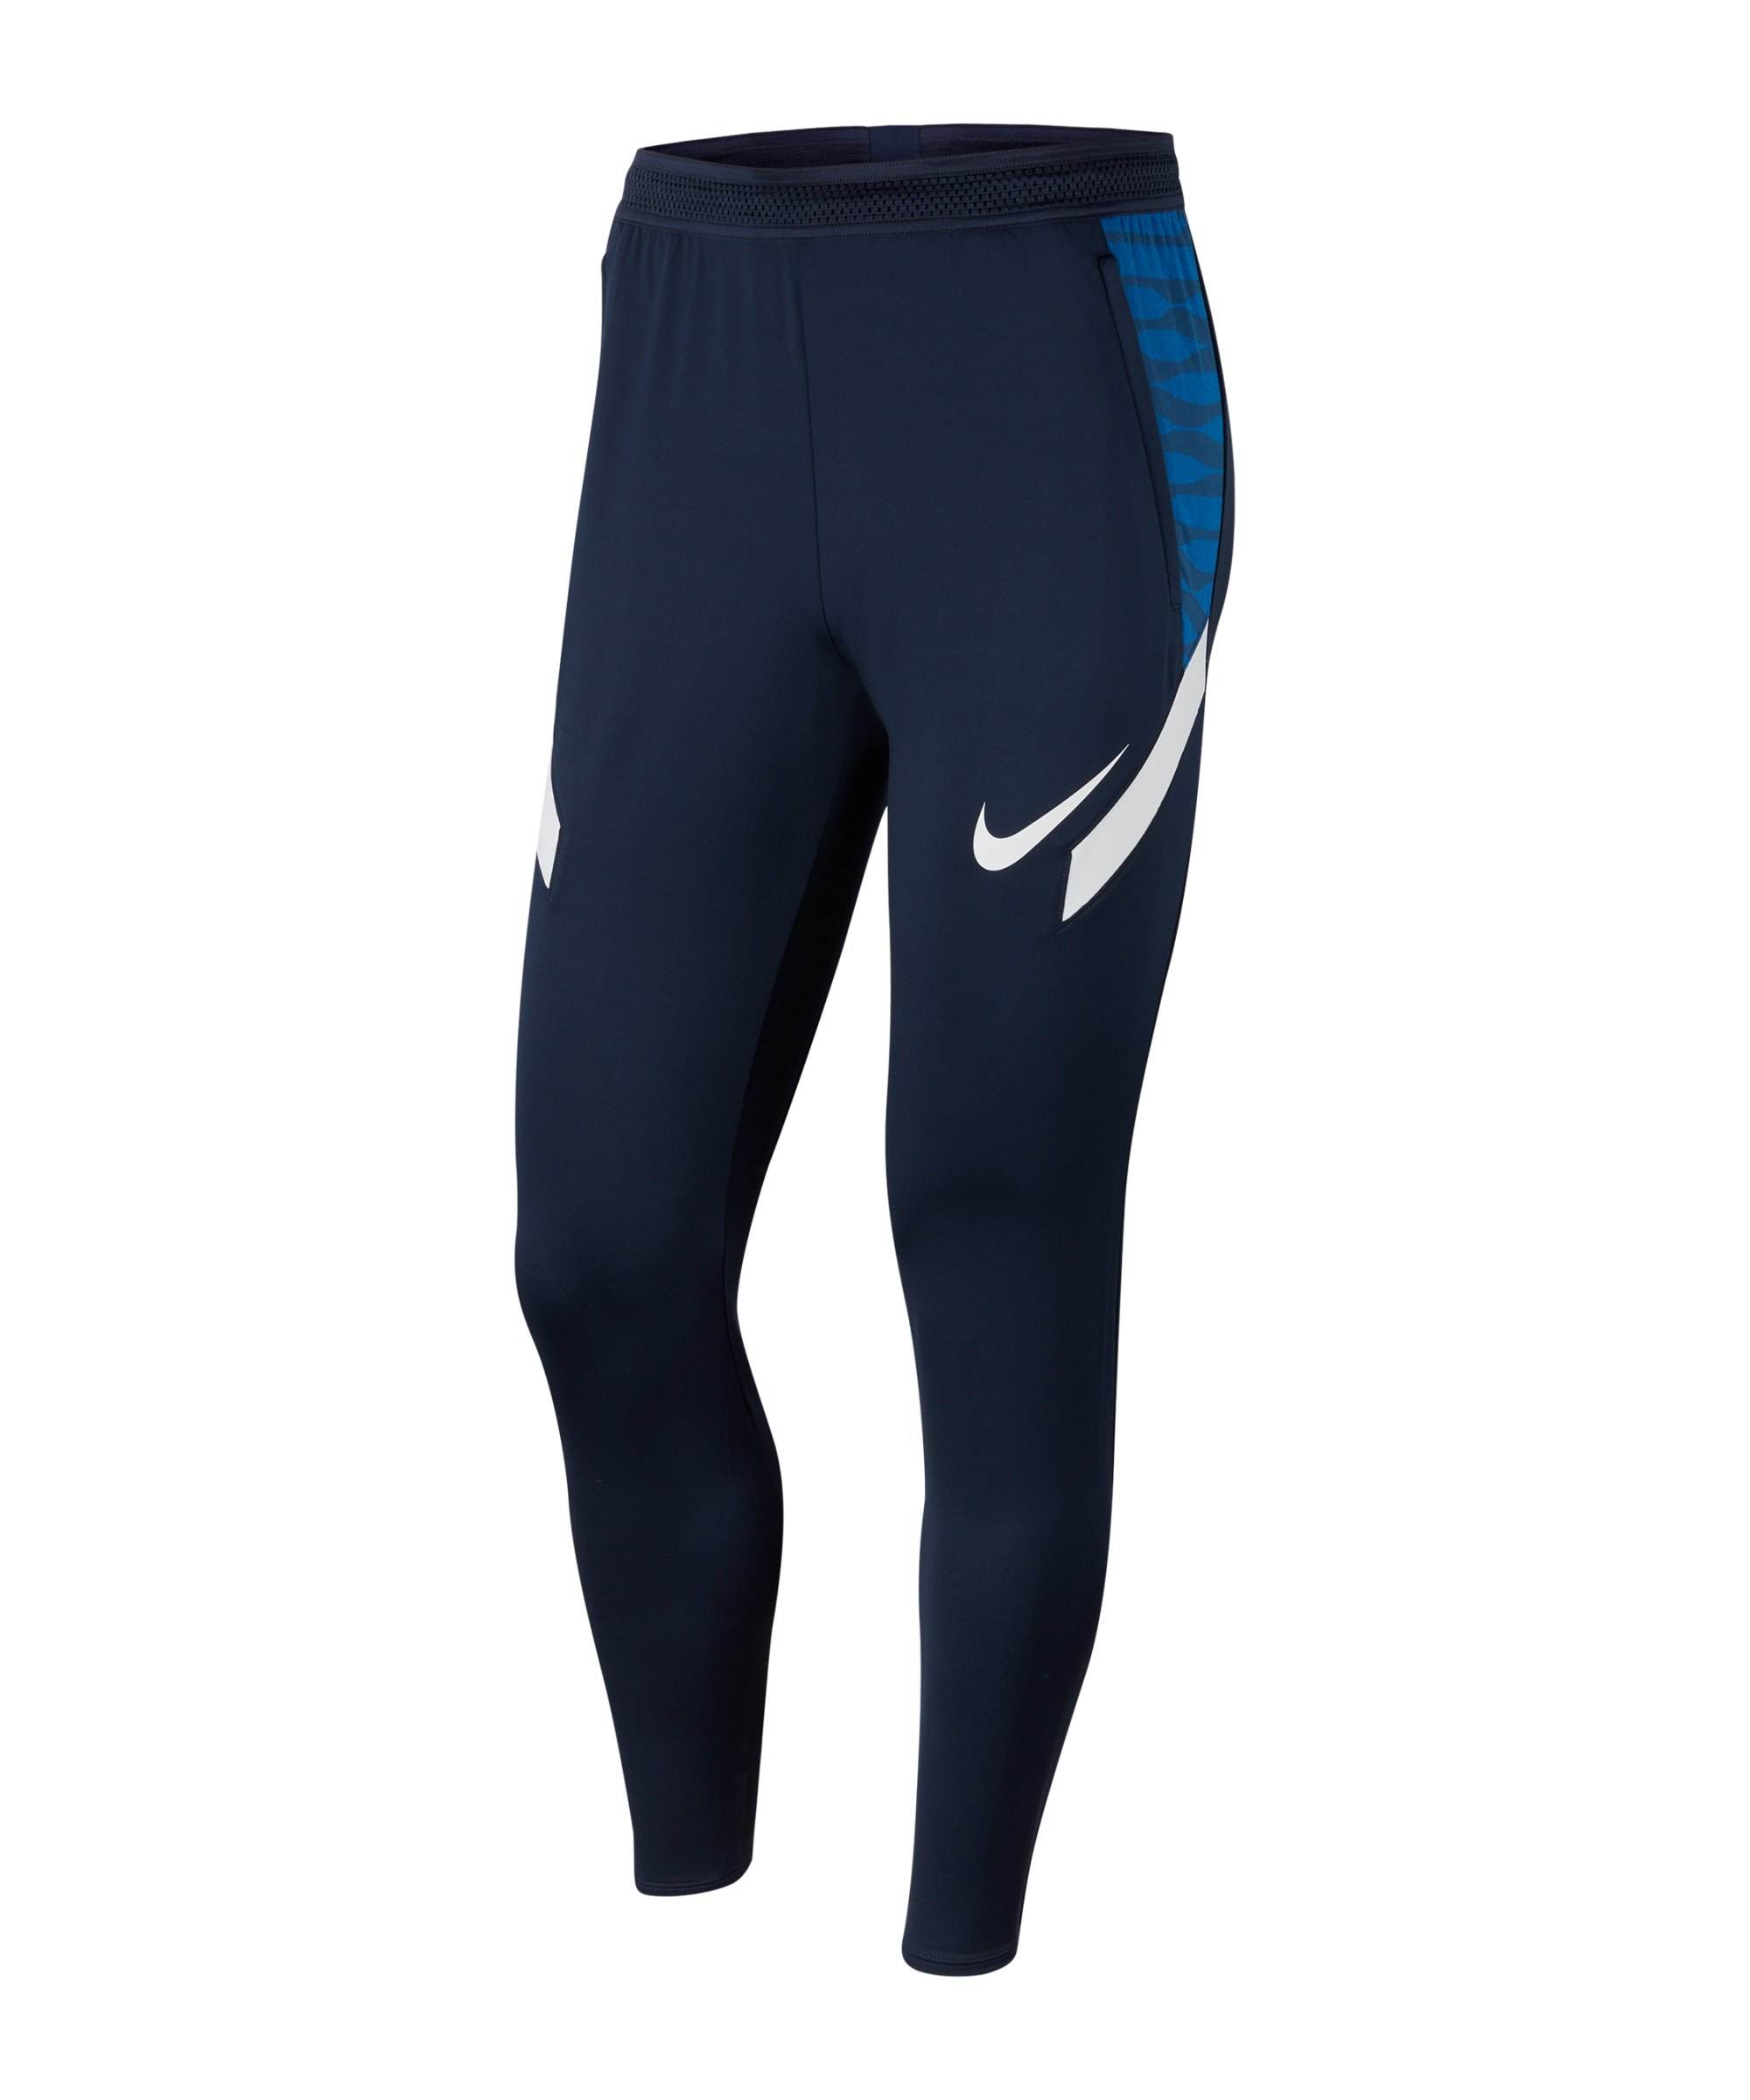 Nike Strike 21 Trainingshose Blau Weiss F451 - blau